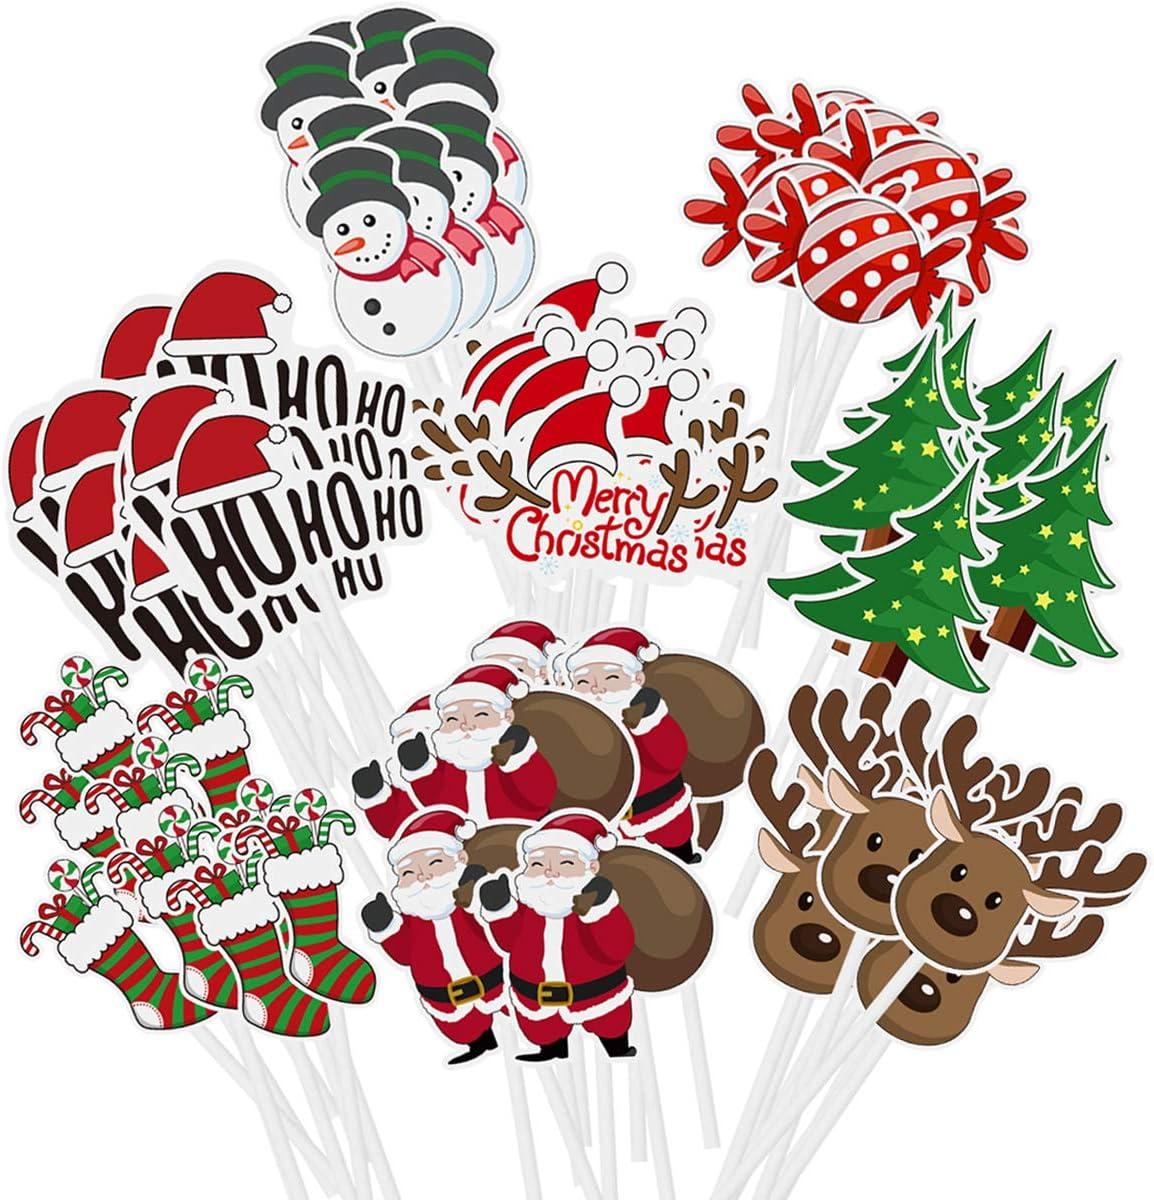 Amosfun 72PCS Christmas Cupcake Toppers Cake Decoration Santa Claus Tree Snowman Sock Candy Theme Party Cake Toppers Picks Christmas Decoration Supplies